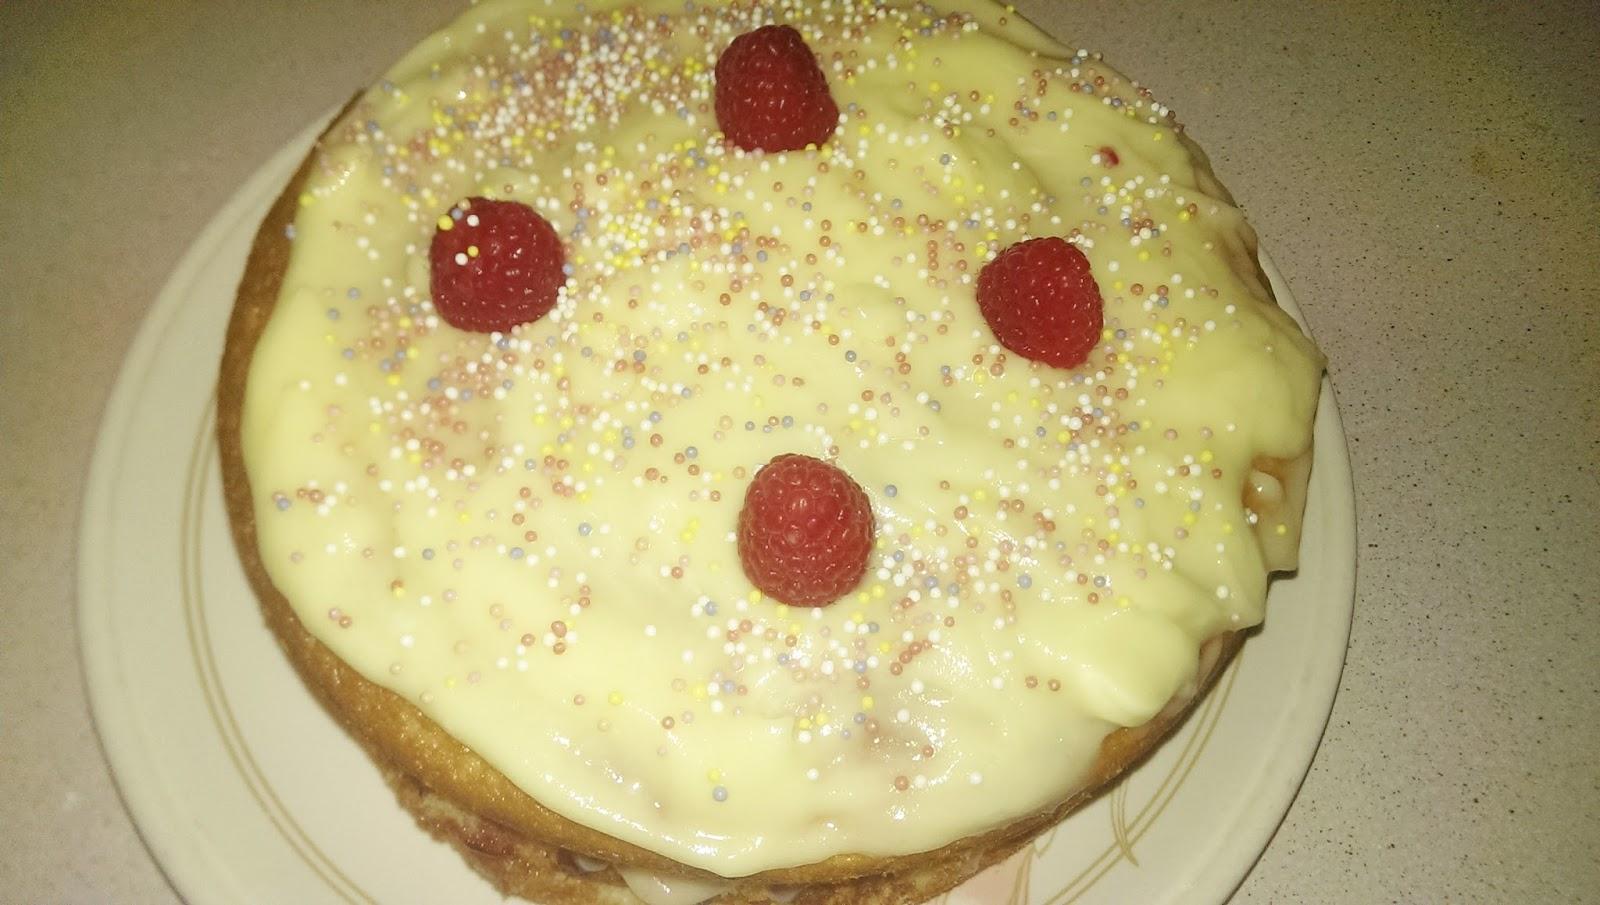 Raspberry & Vanilla Cake